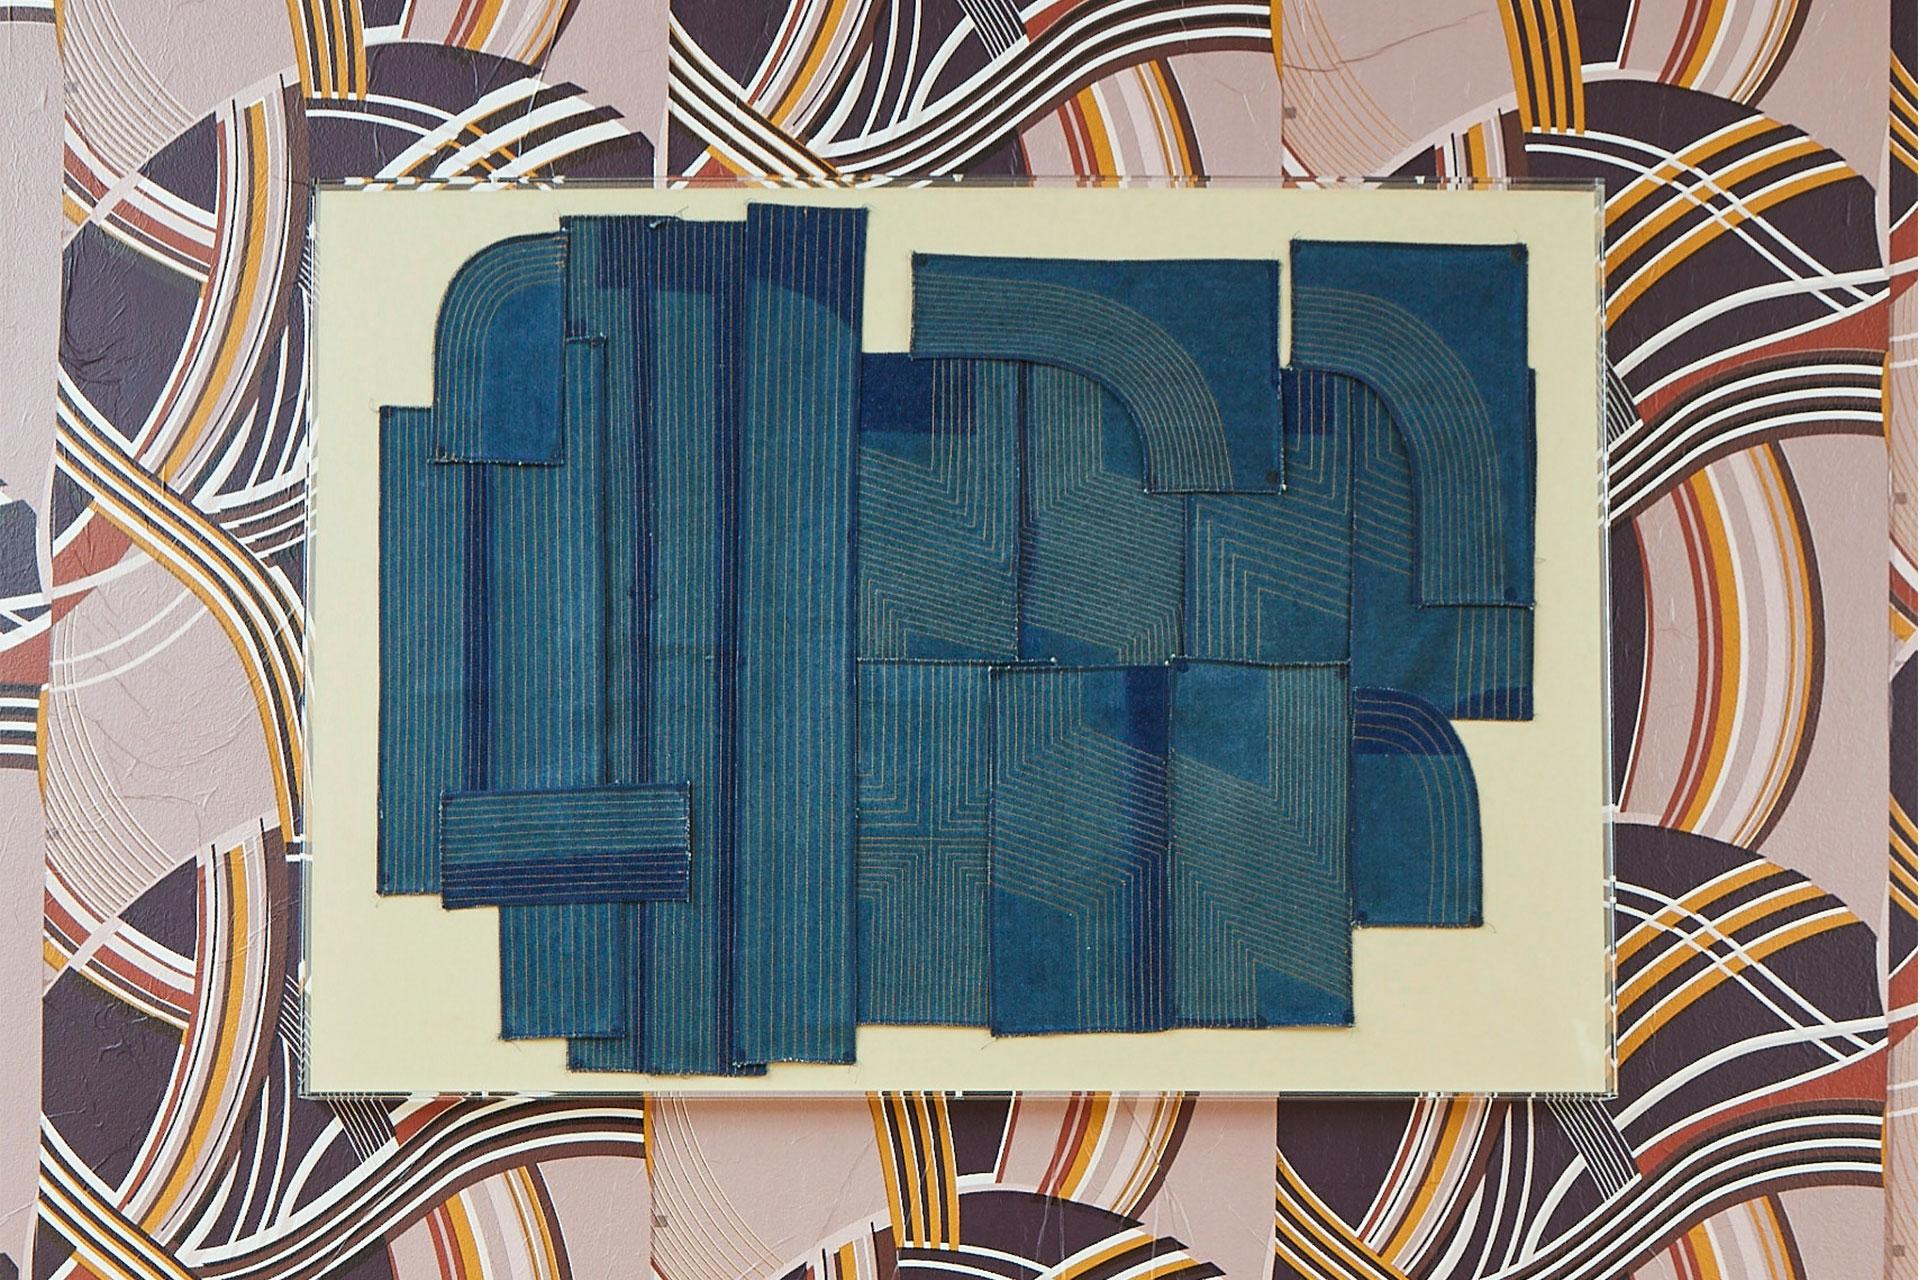 Untitled (practice pieces on denim), 2020, denim thread, 114.3 x 76.2 cm